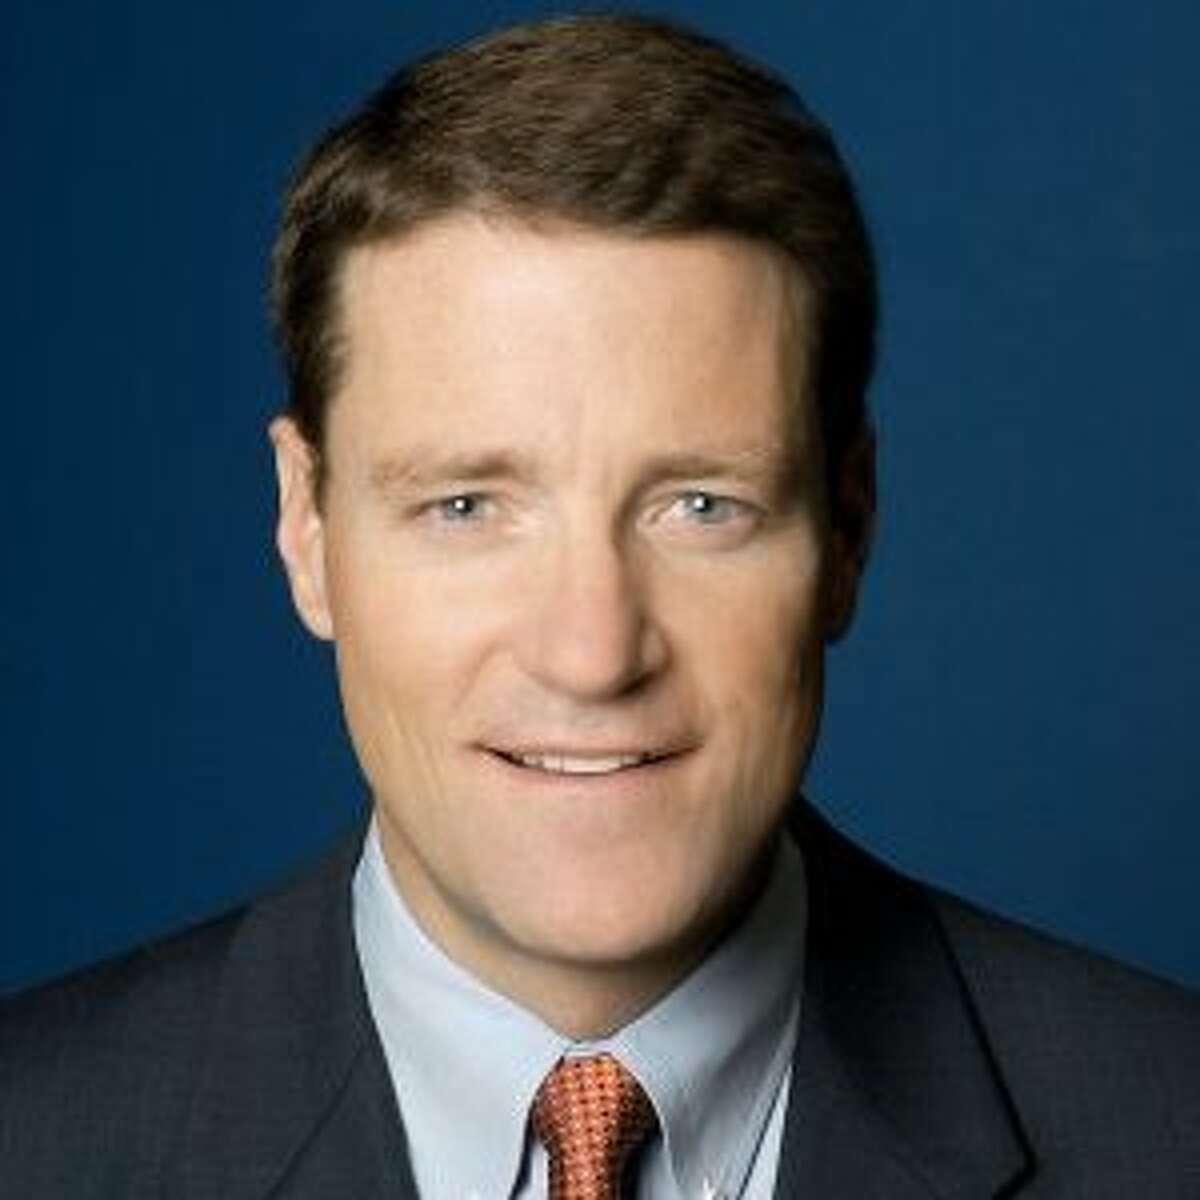 Dallas attorney Bill Mateja is part of Attorney General Ken Paxton's legal team